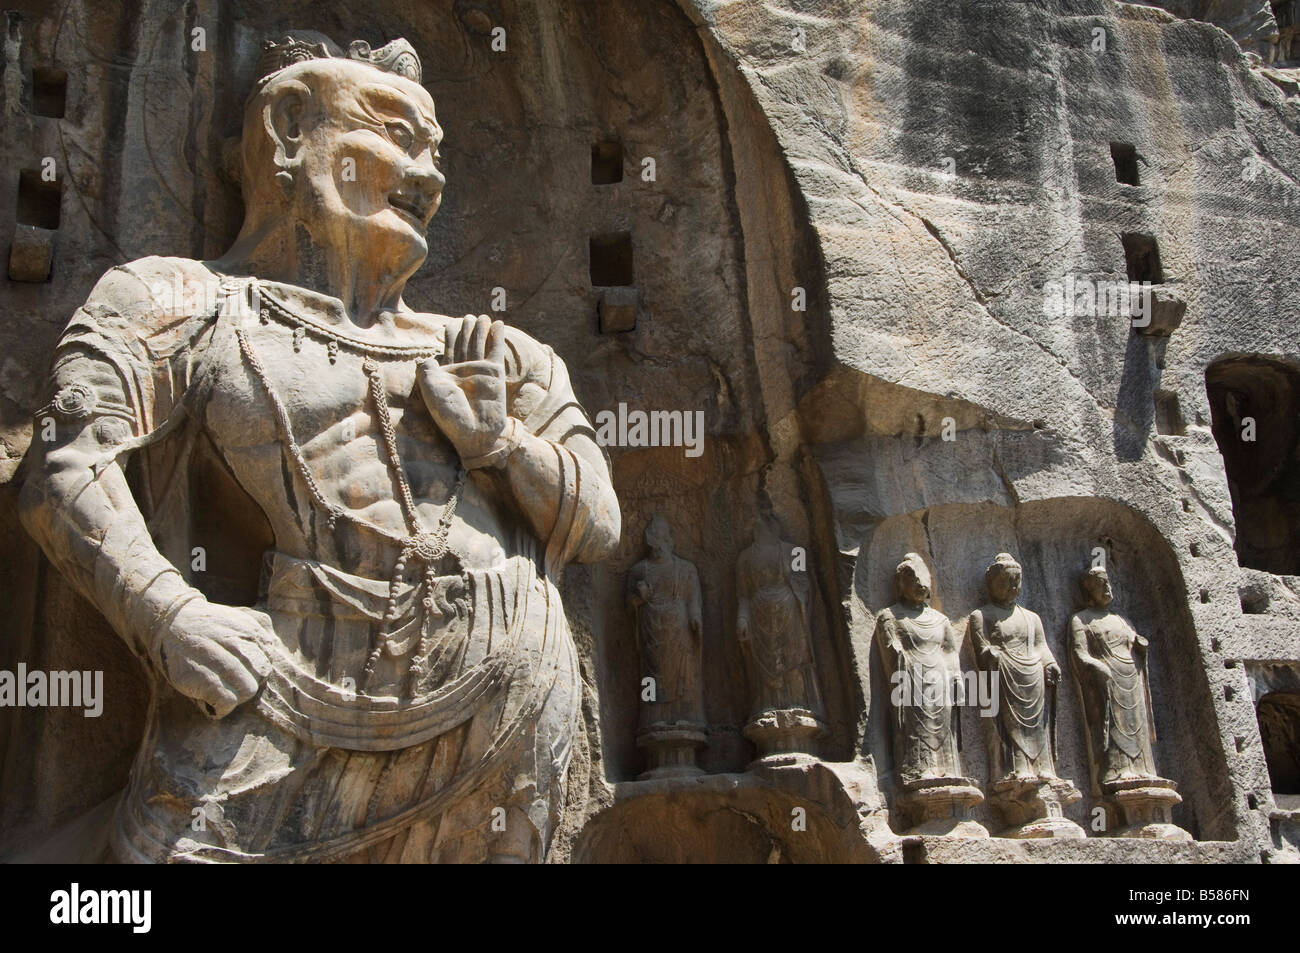 Geschnitzten Buddha-Statuen in Longmen Grotten, Dragon Gate Grotten, Provinz Henan, China Stockbild